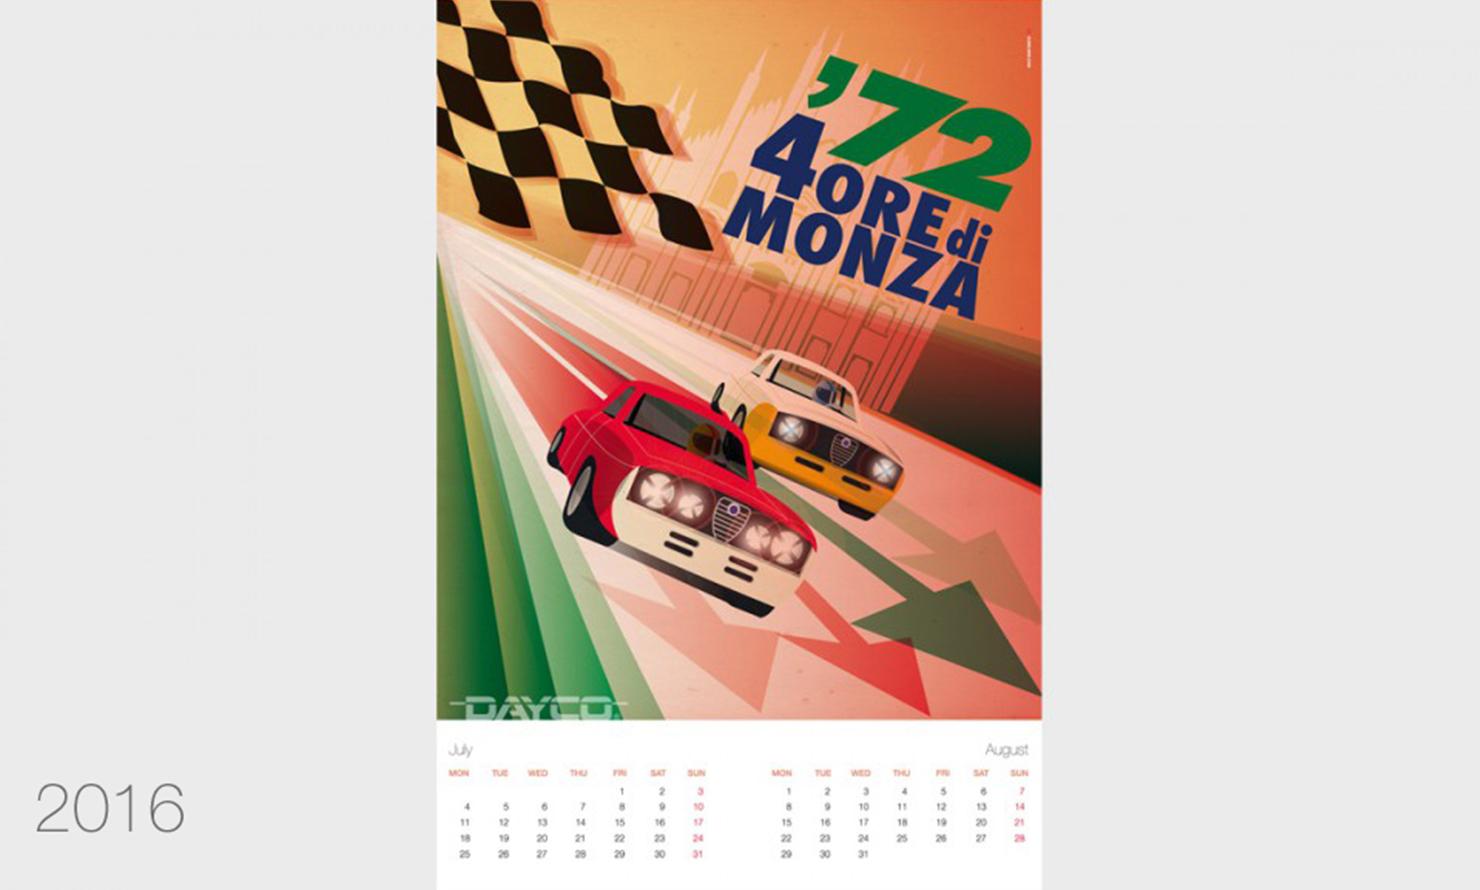 https://kubelibre.com/uploads/Slider-work-tutti-clienti/dayco-calendario-2016-4.jpg